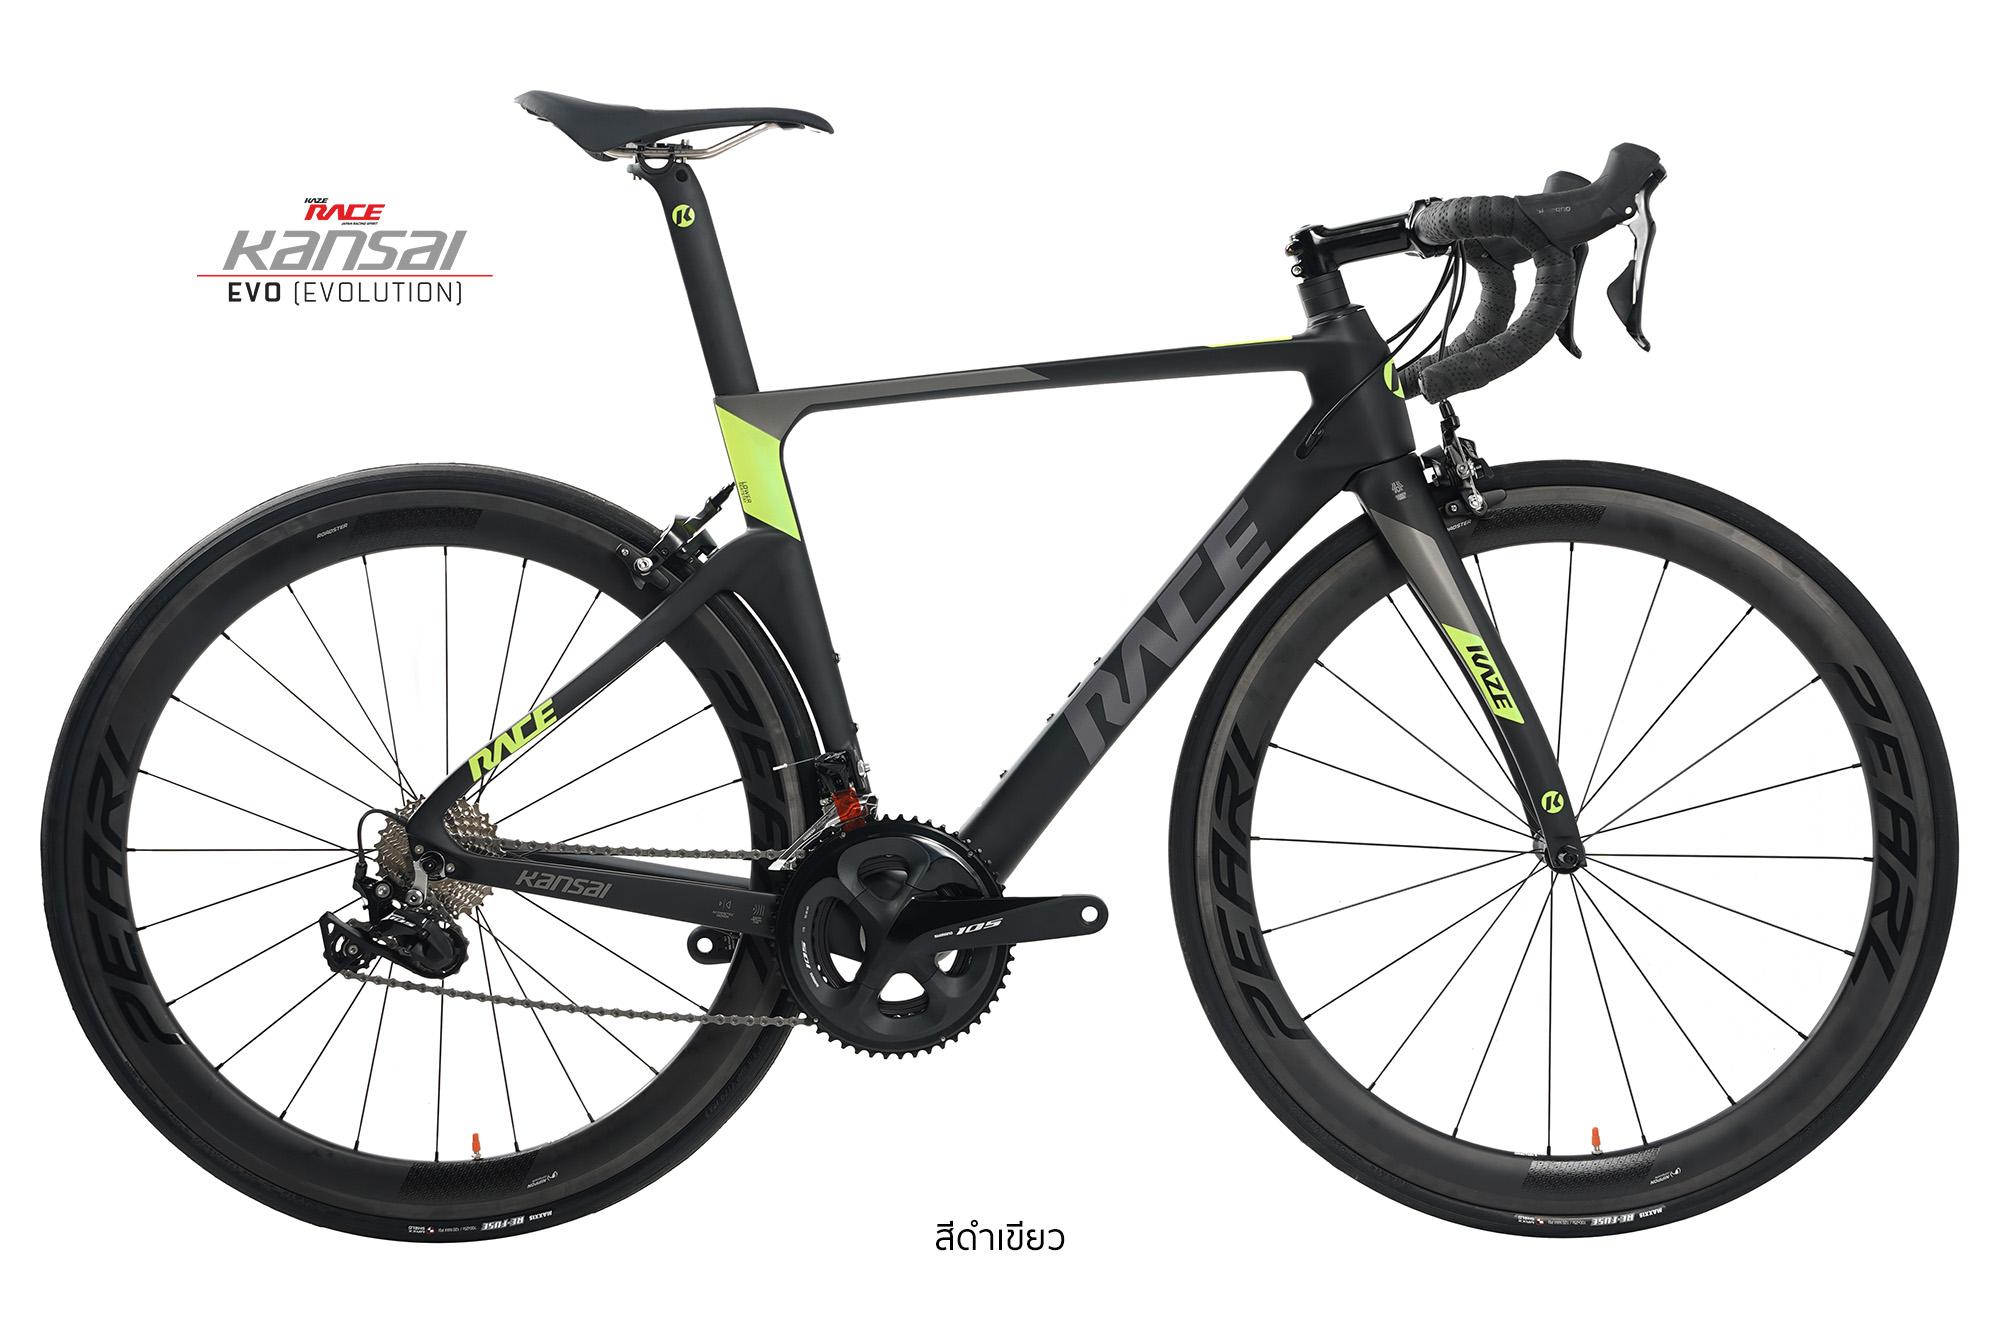 KAZE RACE | Kansai EVO (Evolution) Carbon Wheel